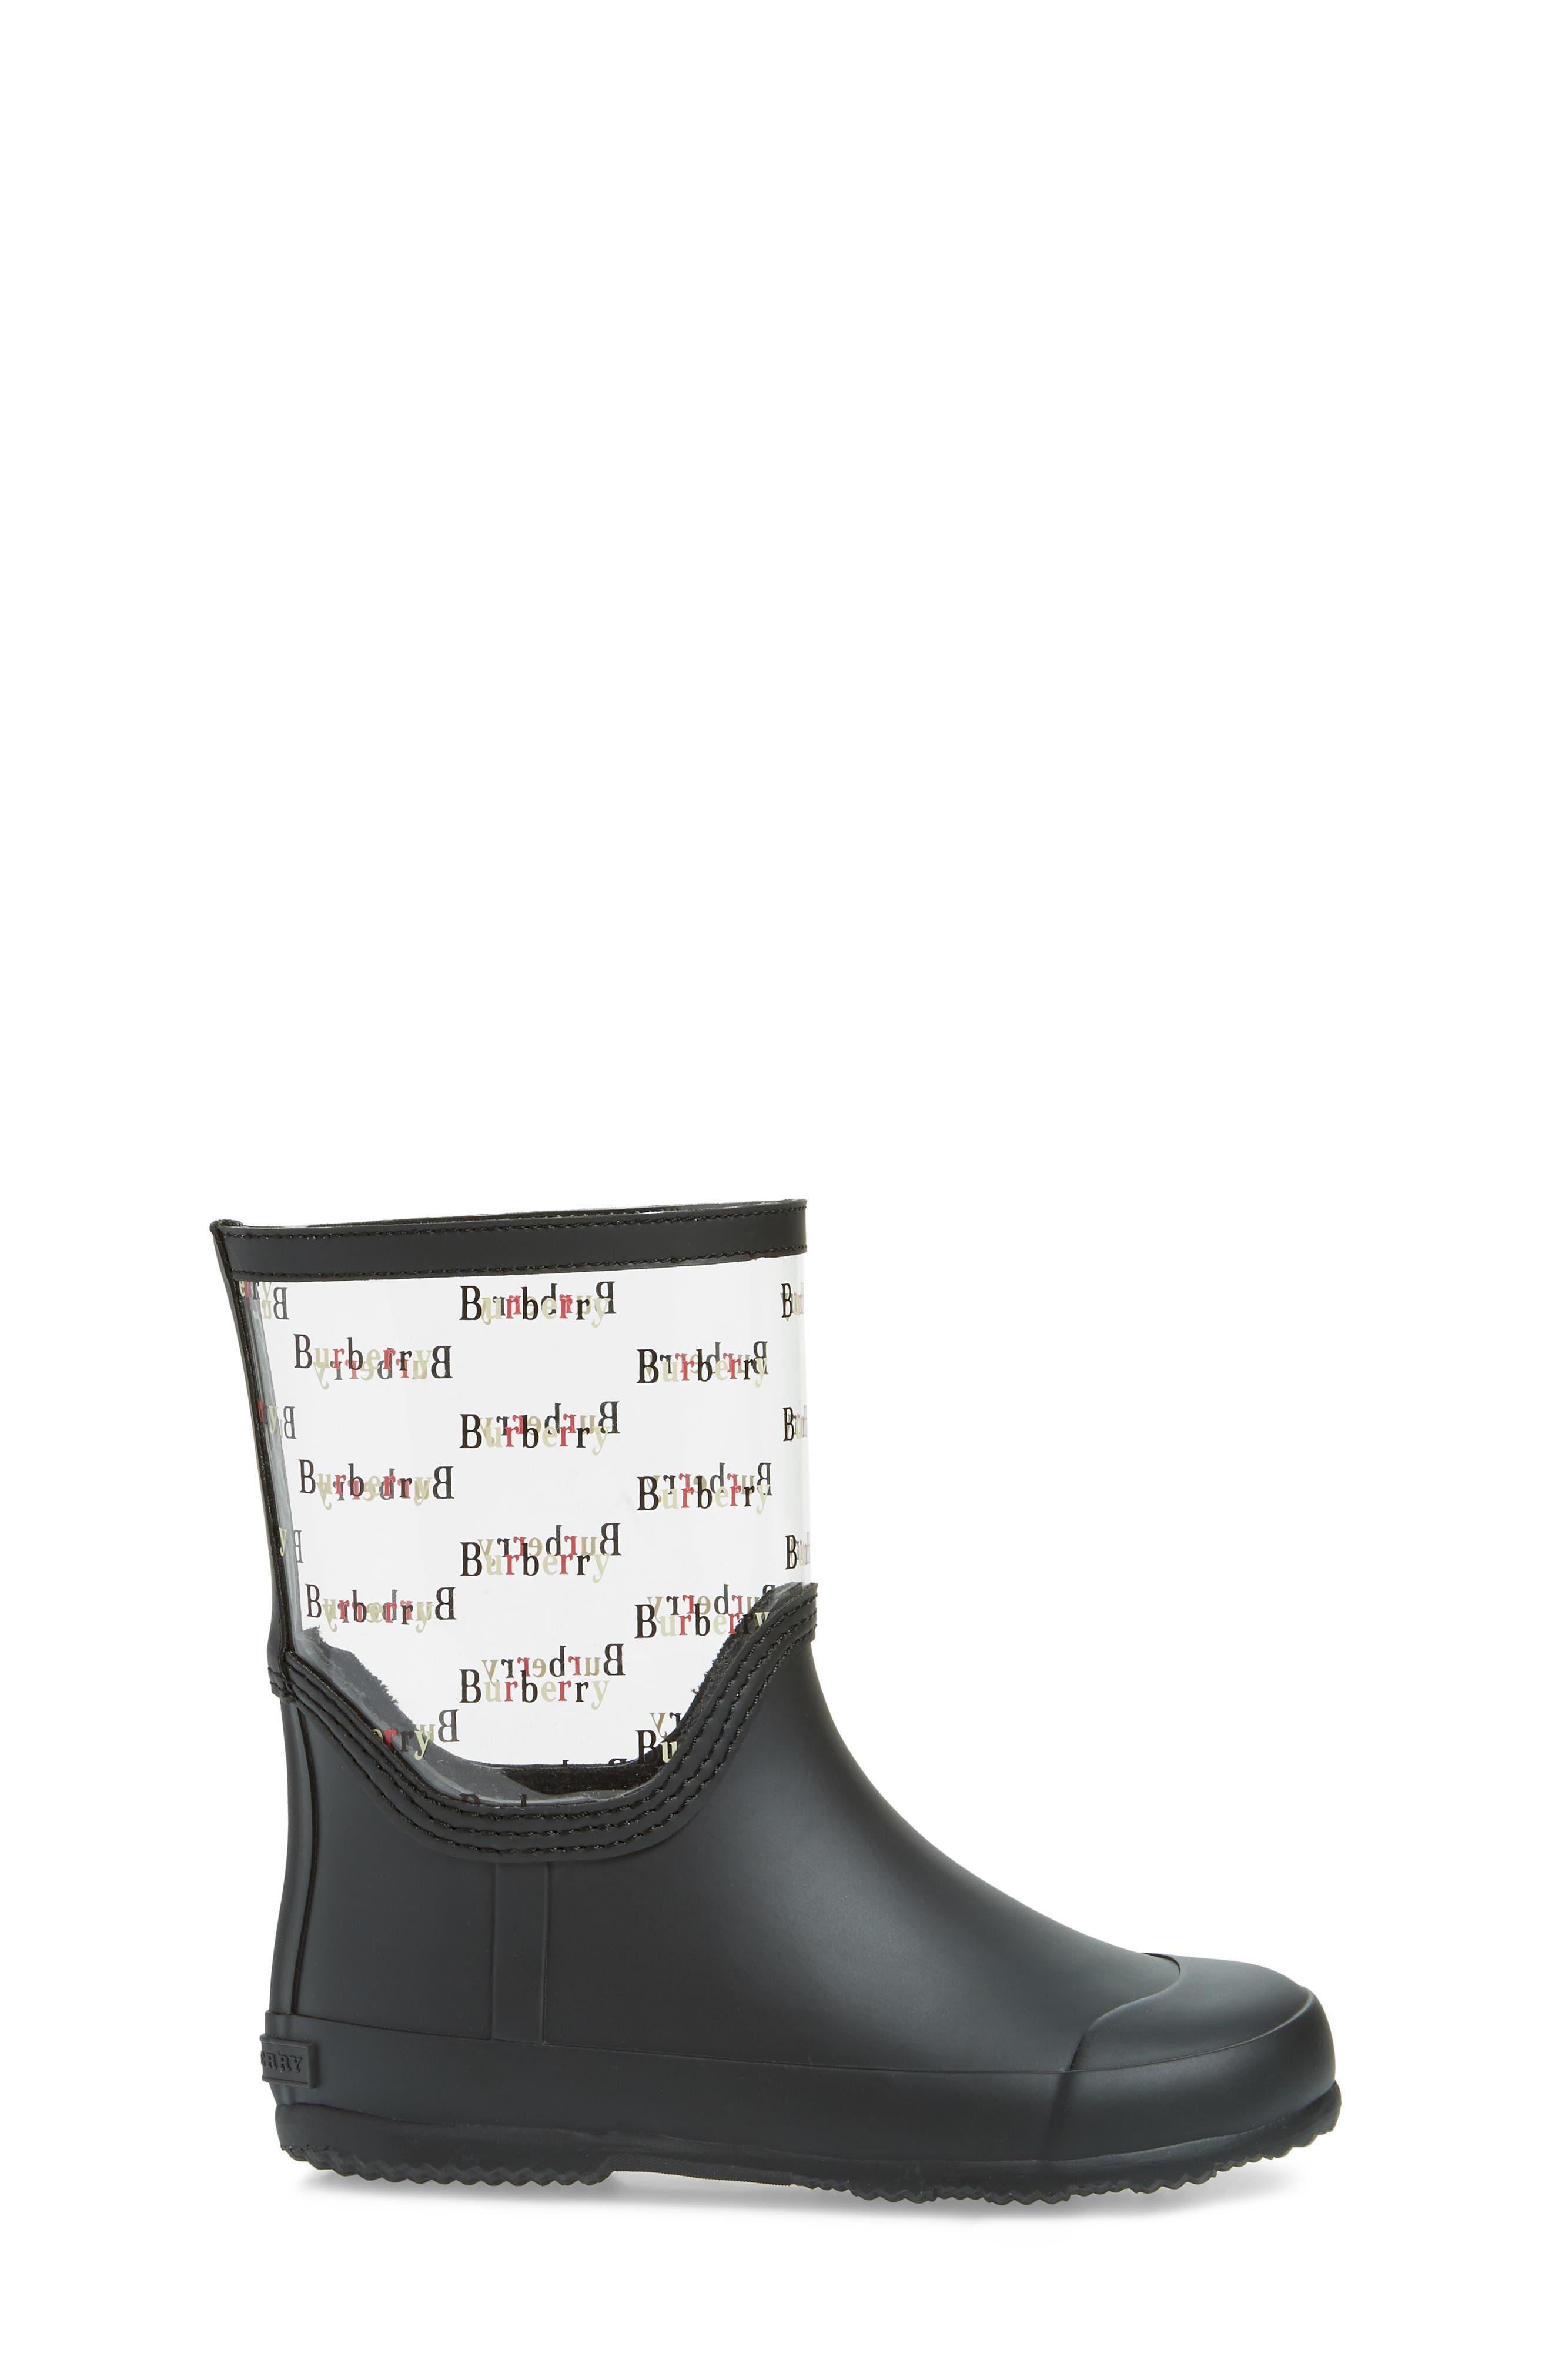 BURBERRY, Frosty Waterproof Rain Boot, Alternate thumbnail 3, color, BLACK